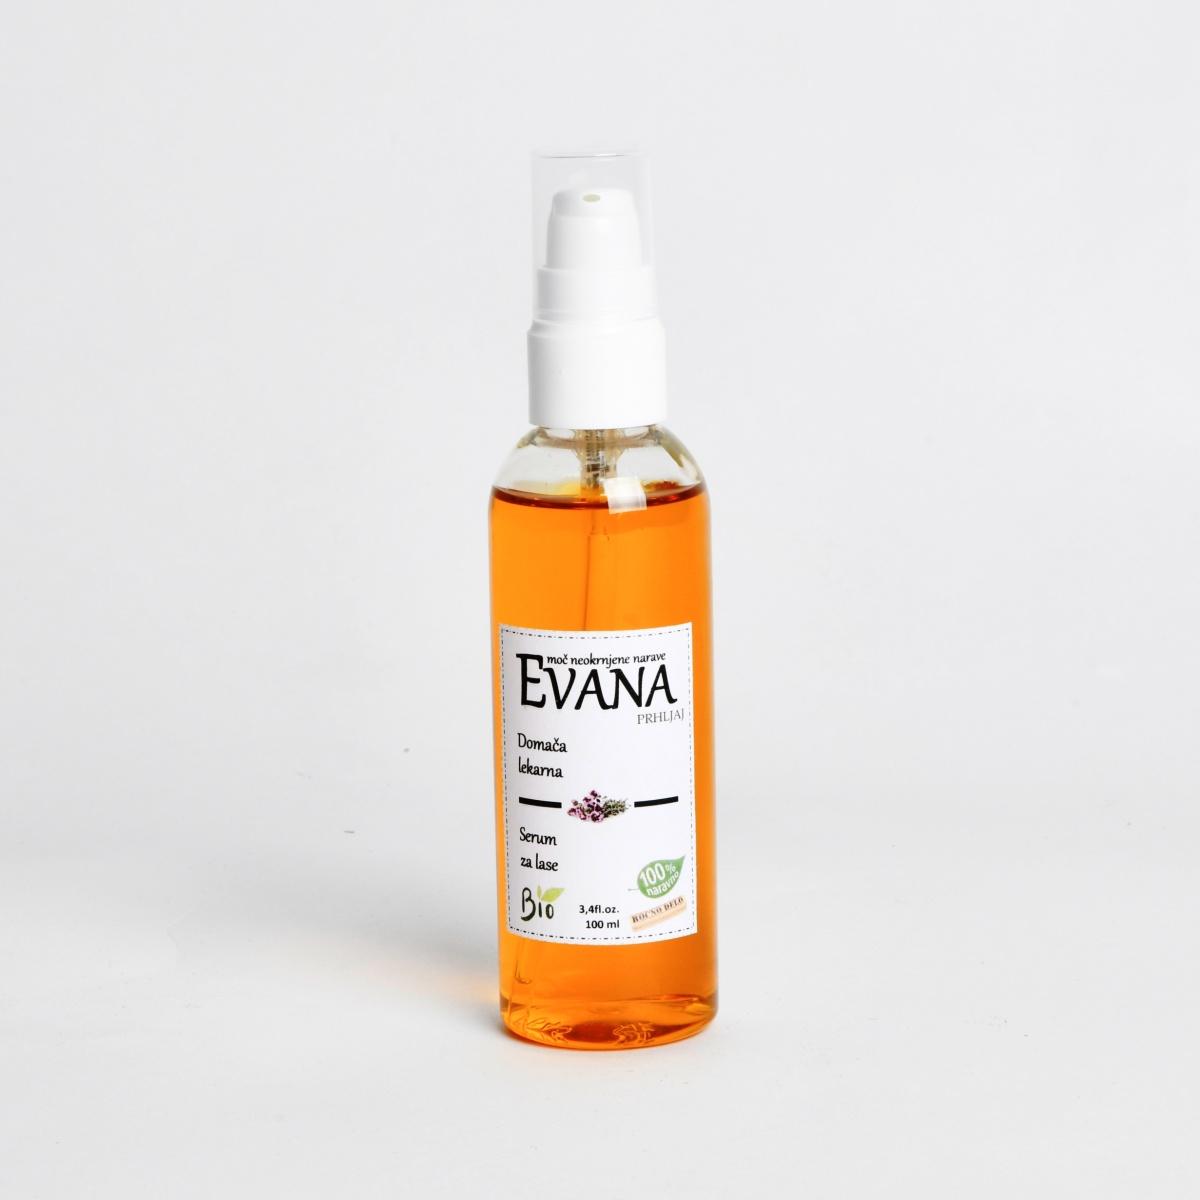 BIO serum za lase 02 05 06 100